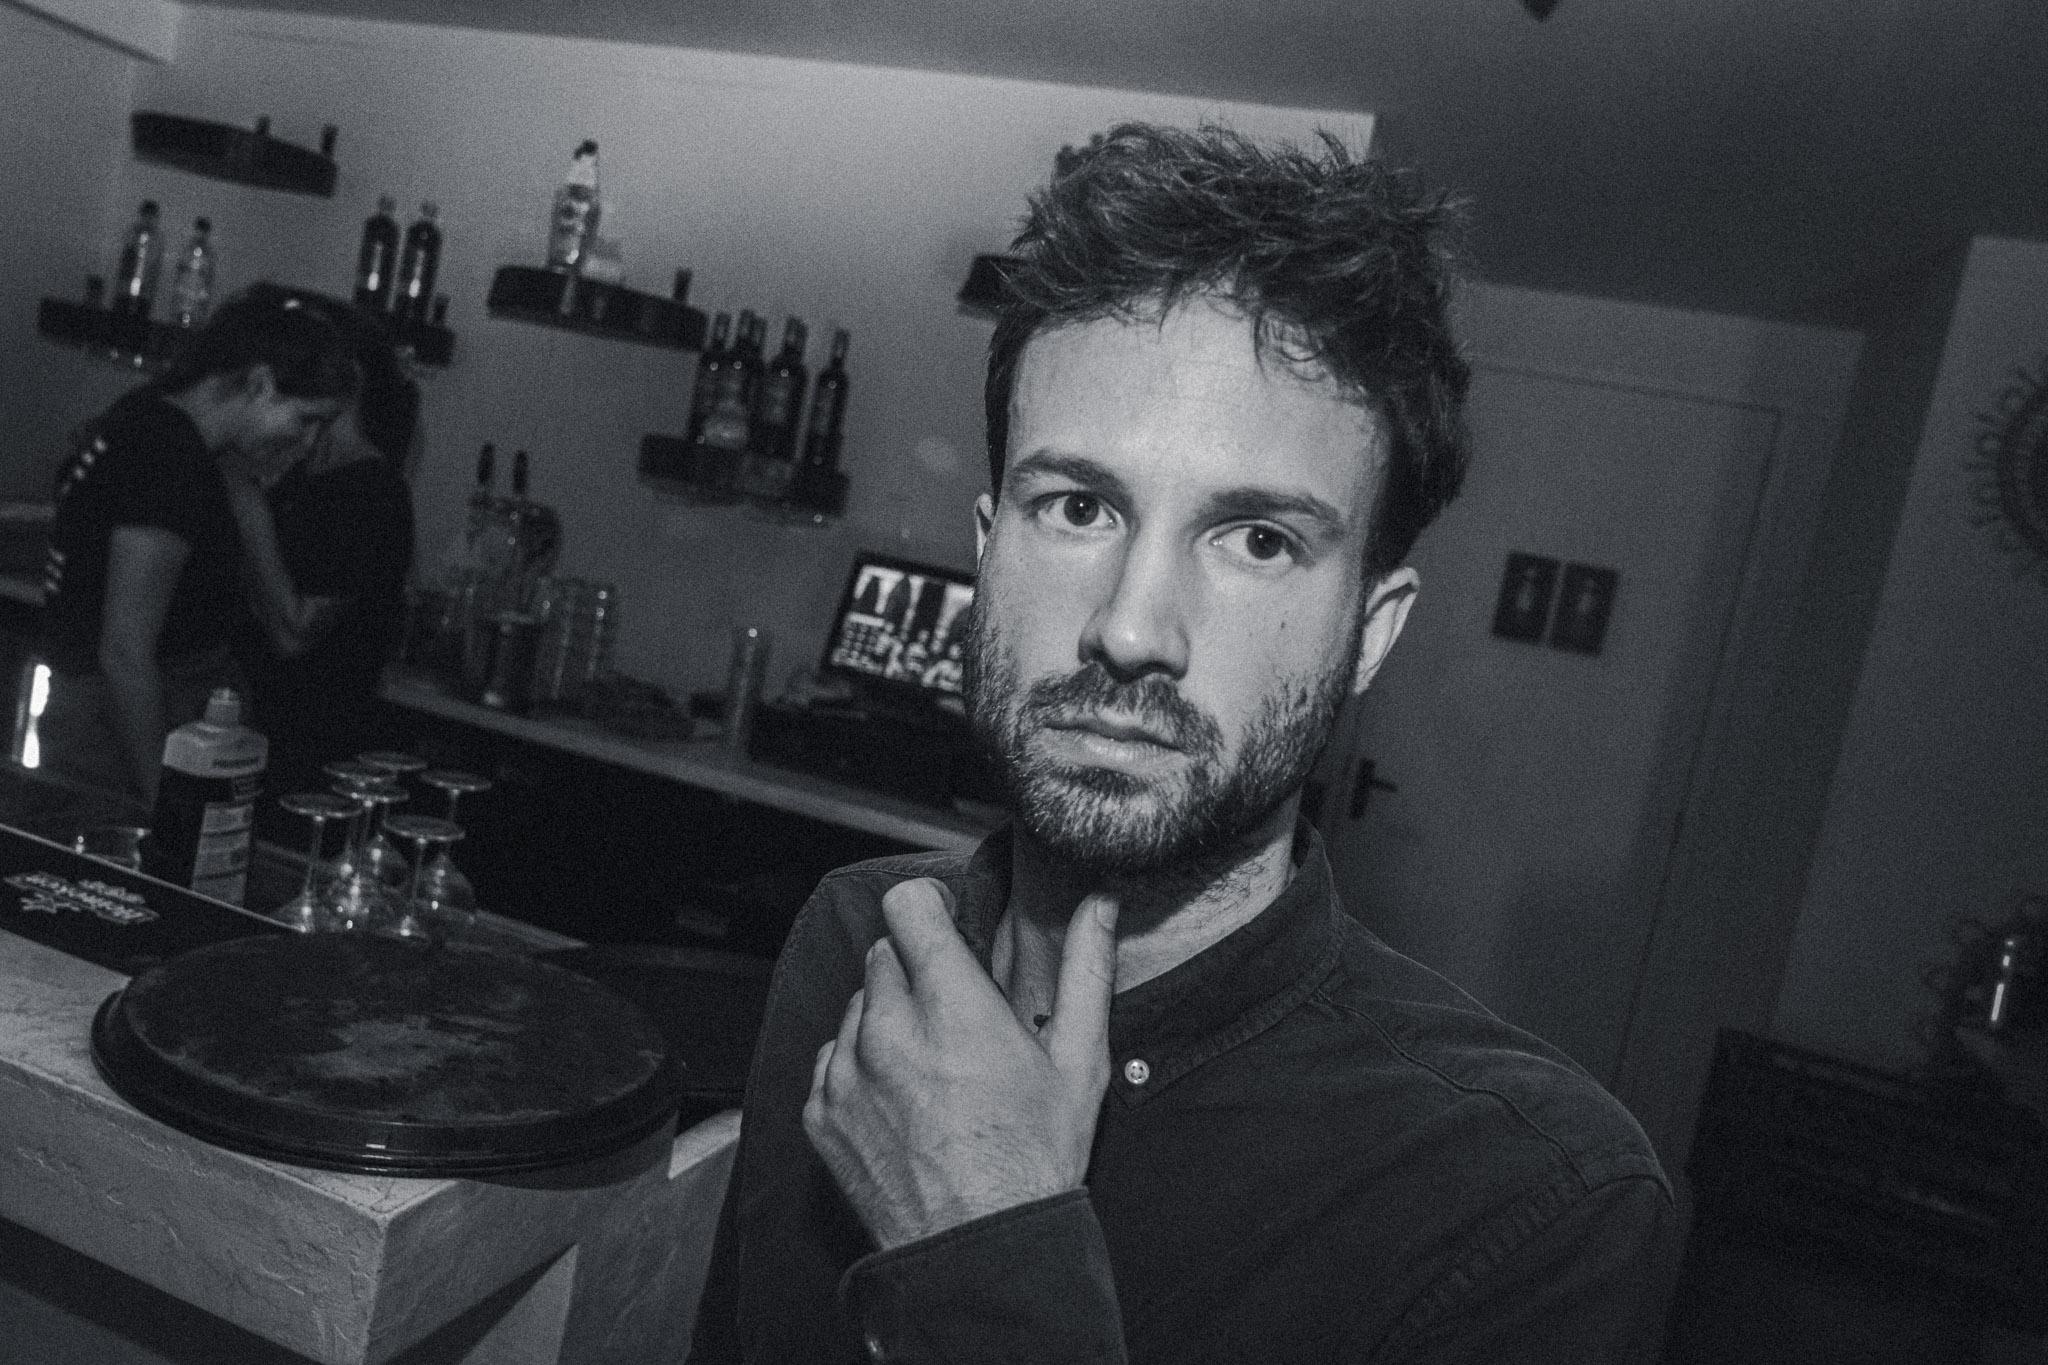 Pierre-Yves Jortay - Break The Ice Forum - Amsterdam 08-2019 - 122.jpg